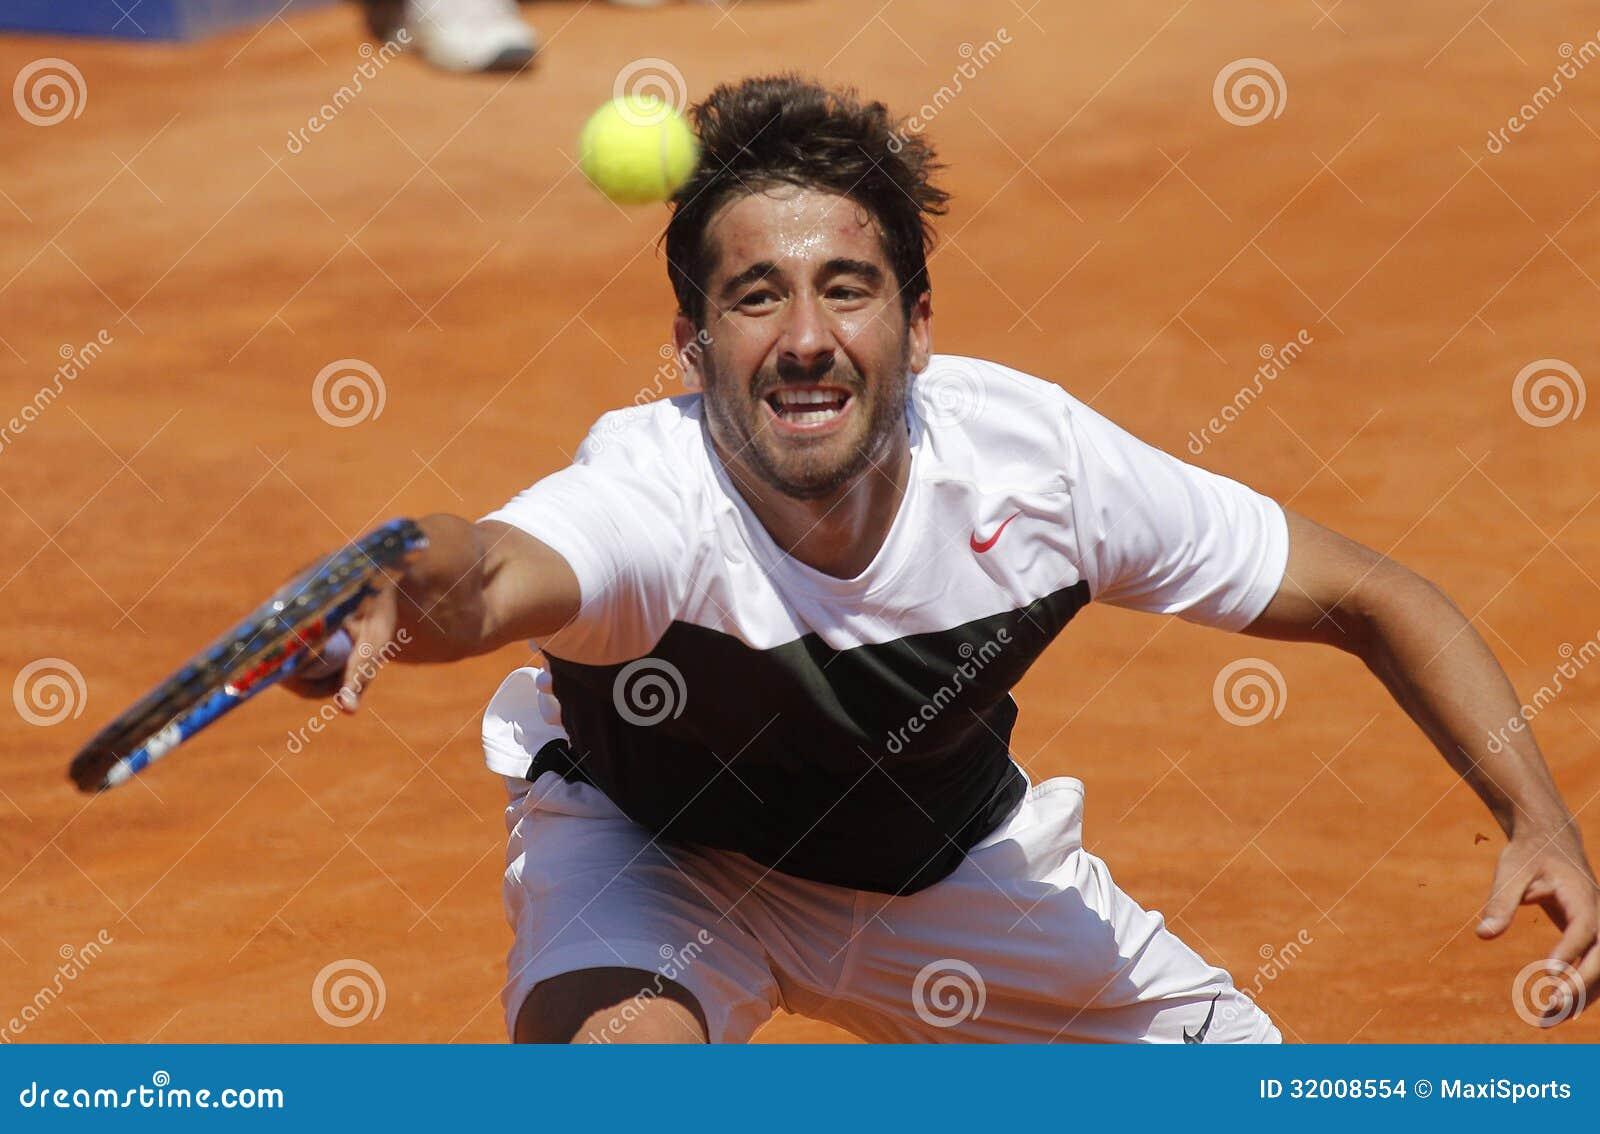 Spanish tennis player Marc Lopez